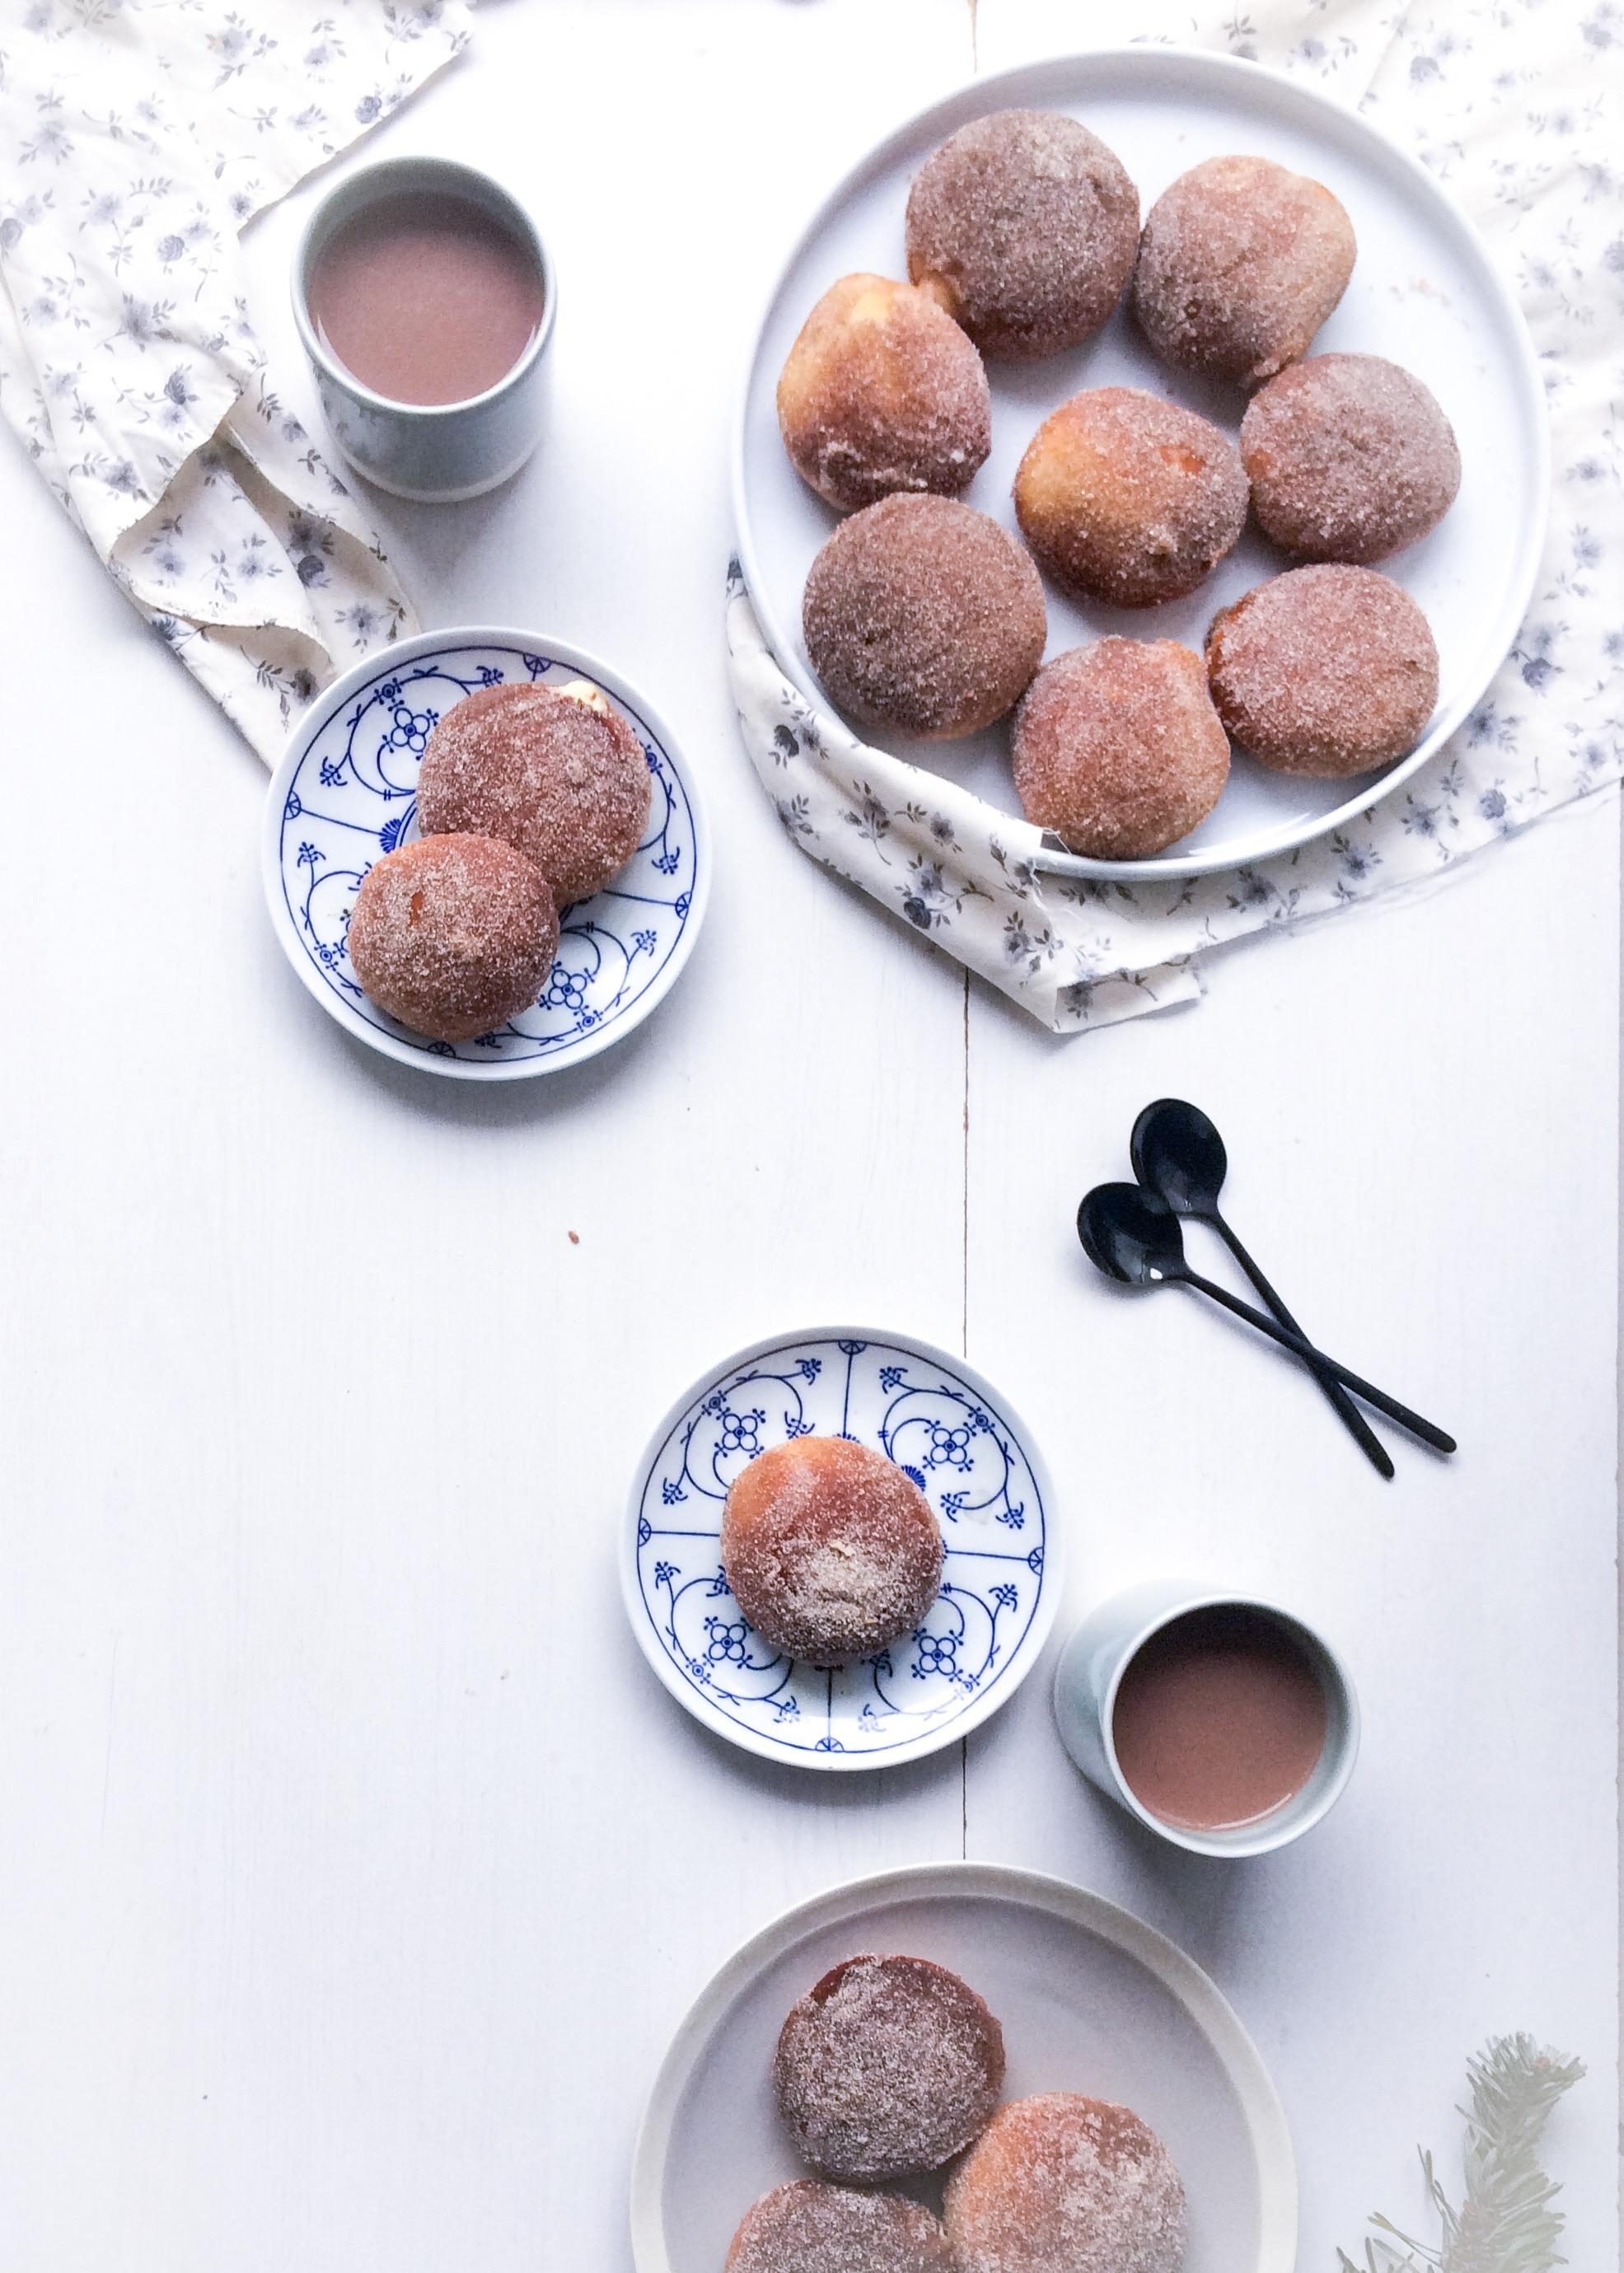 donuts au beurre de cacahu te lo dans la farine. Black Bedroom Furniture Sets. Home Design Ideas